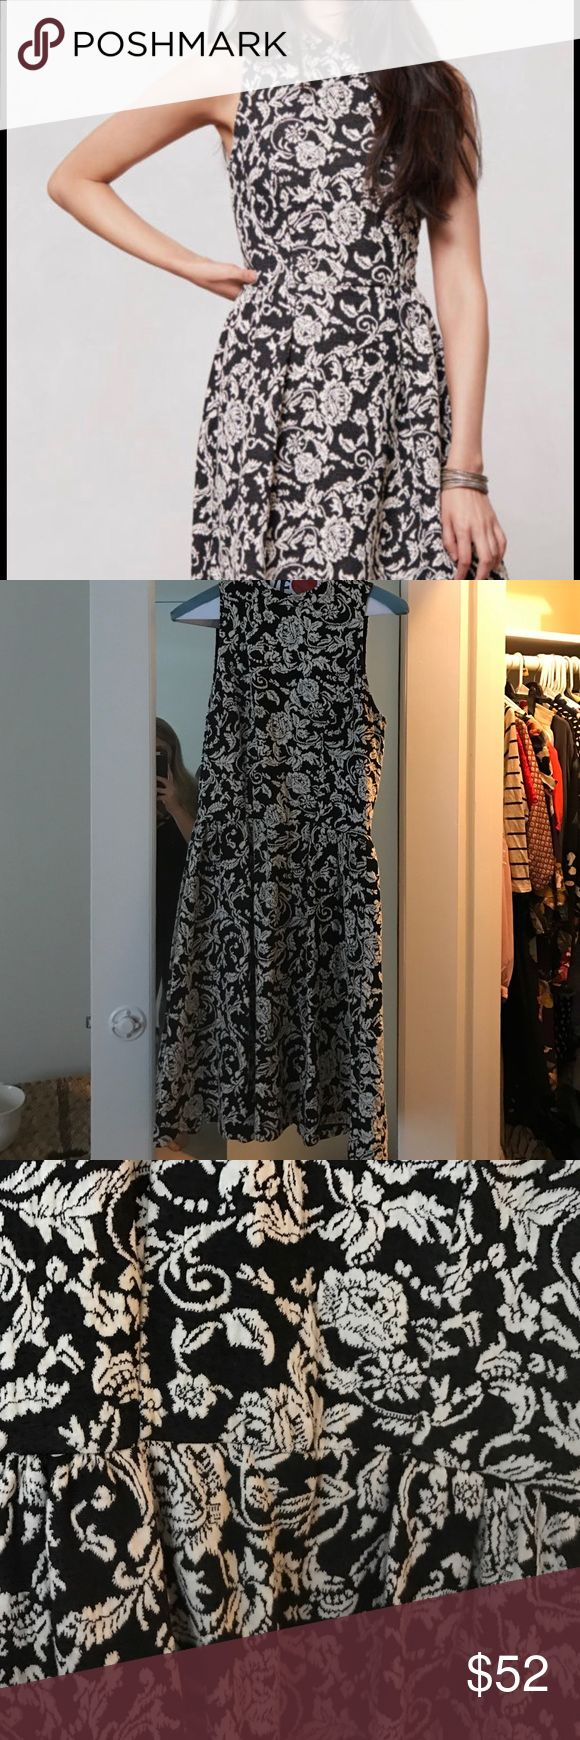 Anthropologie Floribunda Jacquard Dress size XS Anthropologie Floribunda Jacquard Dress by Dolce Vita size XS. Fits more like a small. It has a beautiful floral print and is like new. Anthropologie Dresses Midi